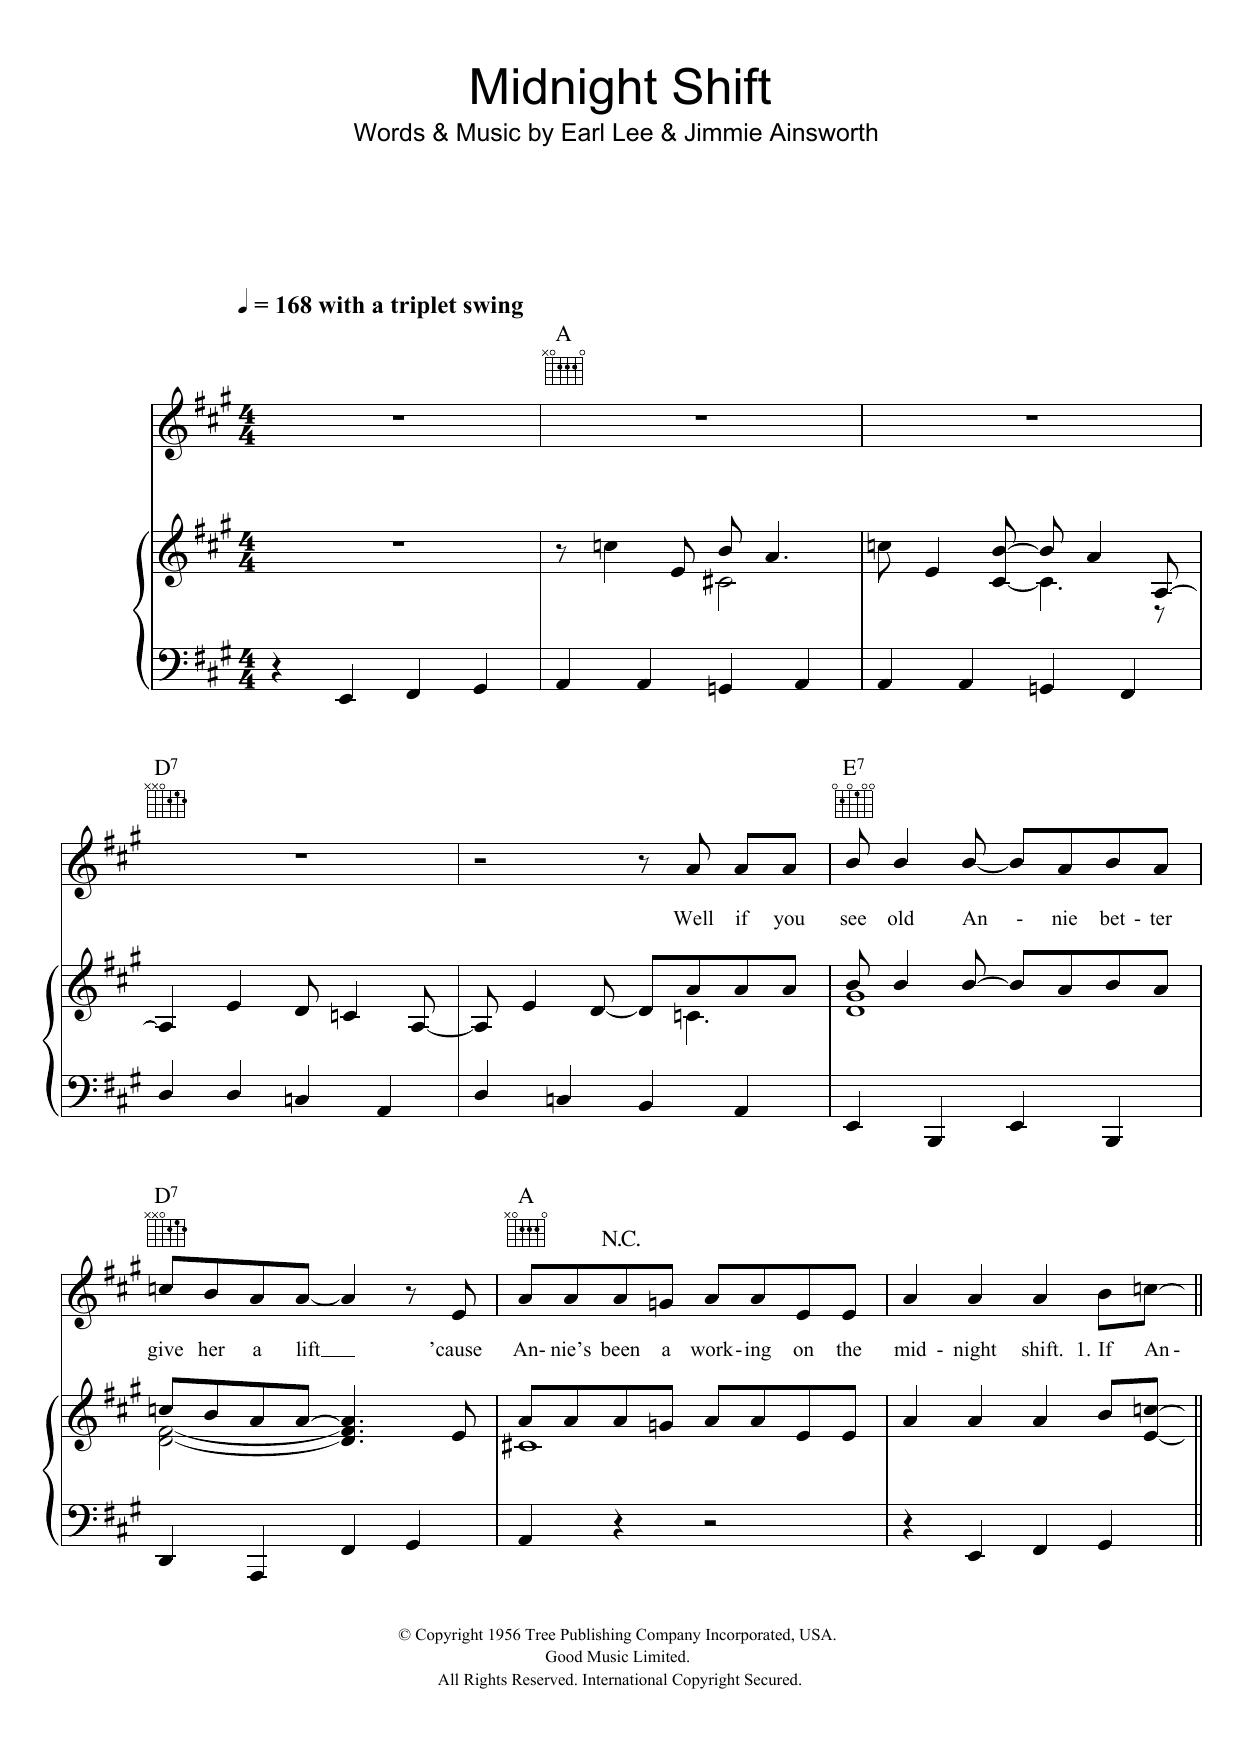 Buddy Holly - Midnight Shift